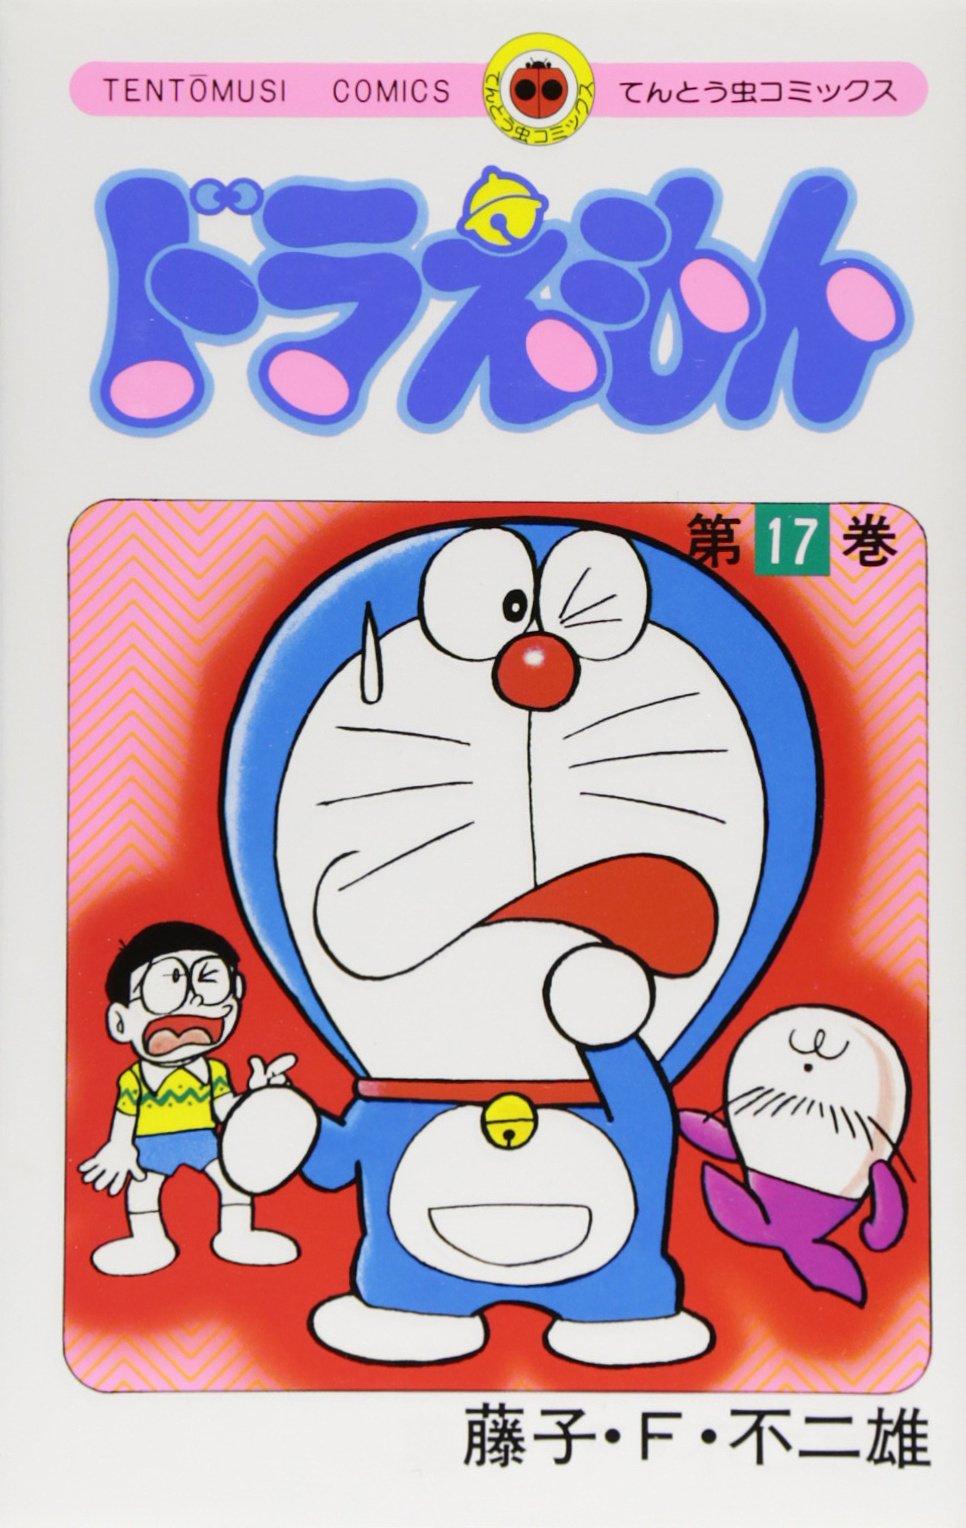 Doraemon 17 (Tentomushi Comics) (Japanese Edition): Fujiko F. Fujio:  9784091401076: Amazon.com: Books